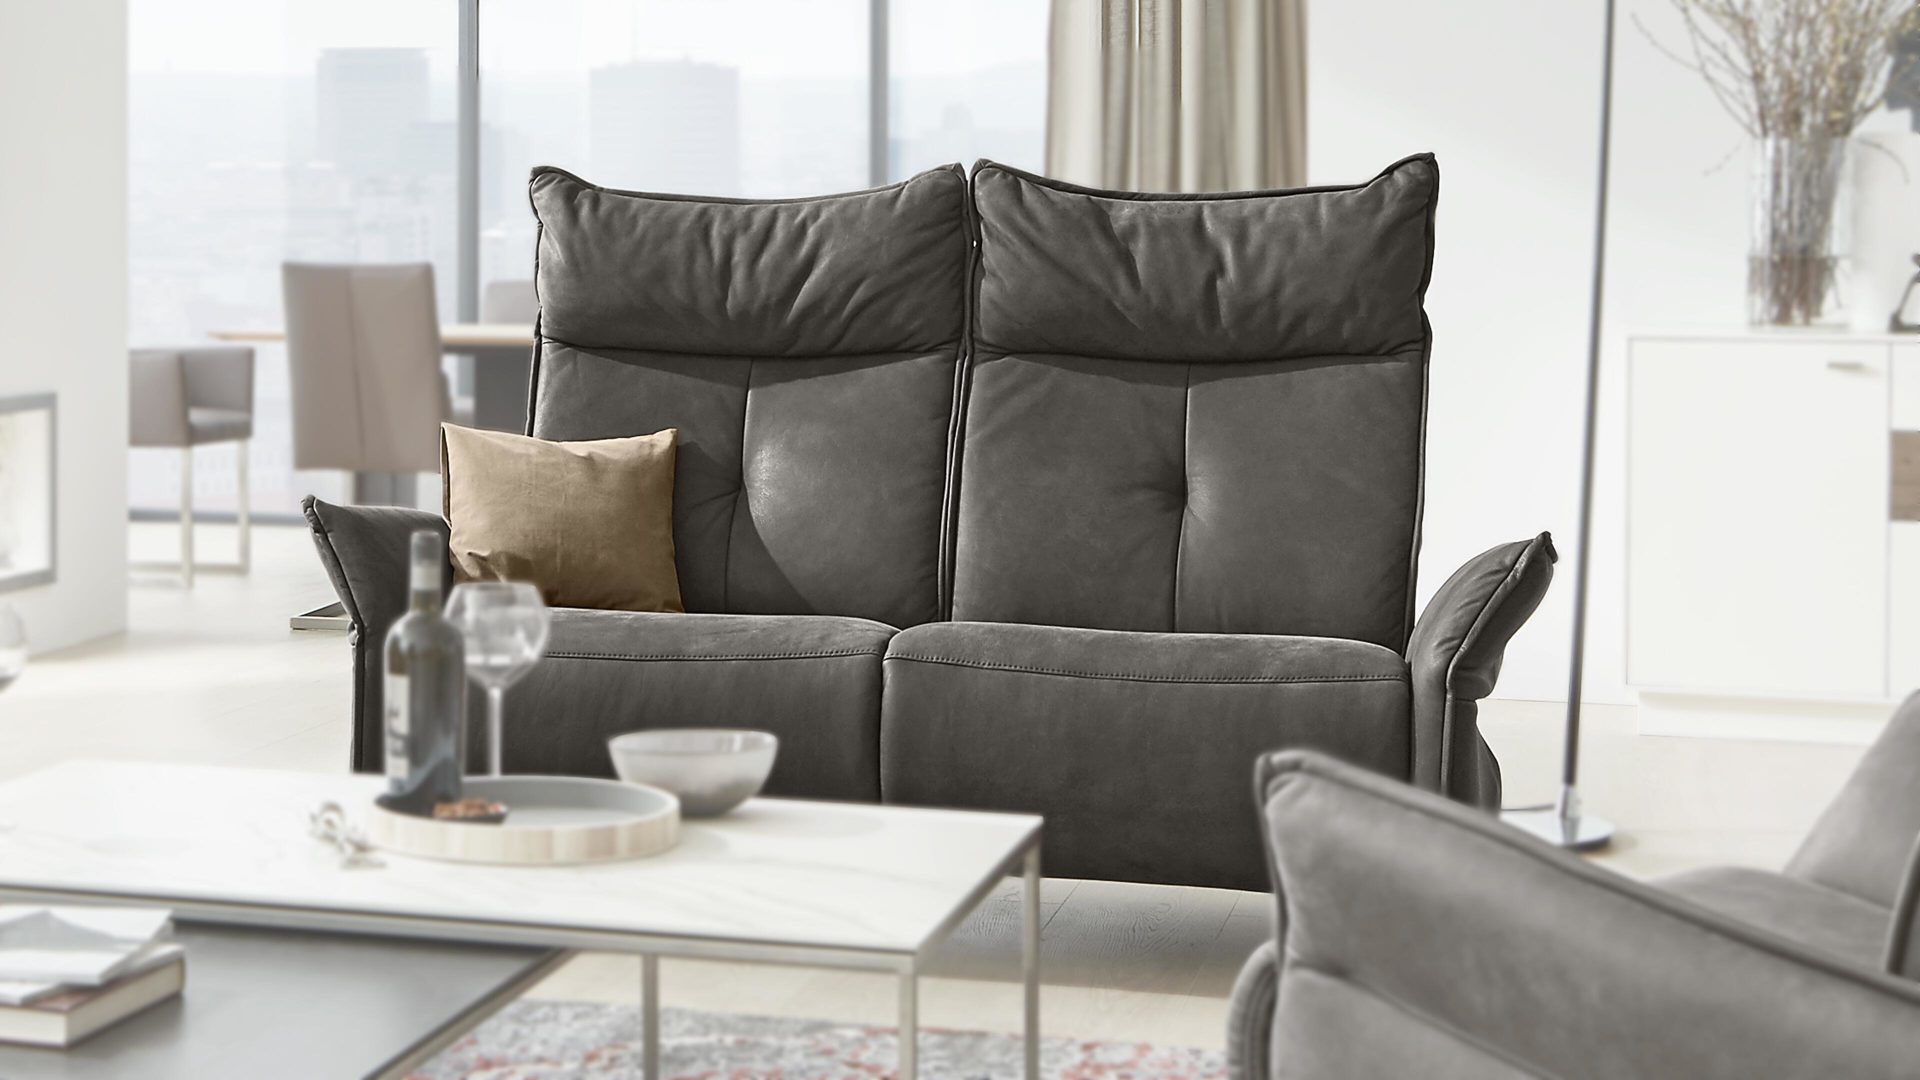 Interliving Sofa Serie 4200 2 5